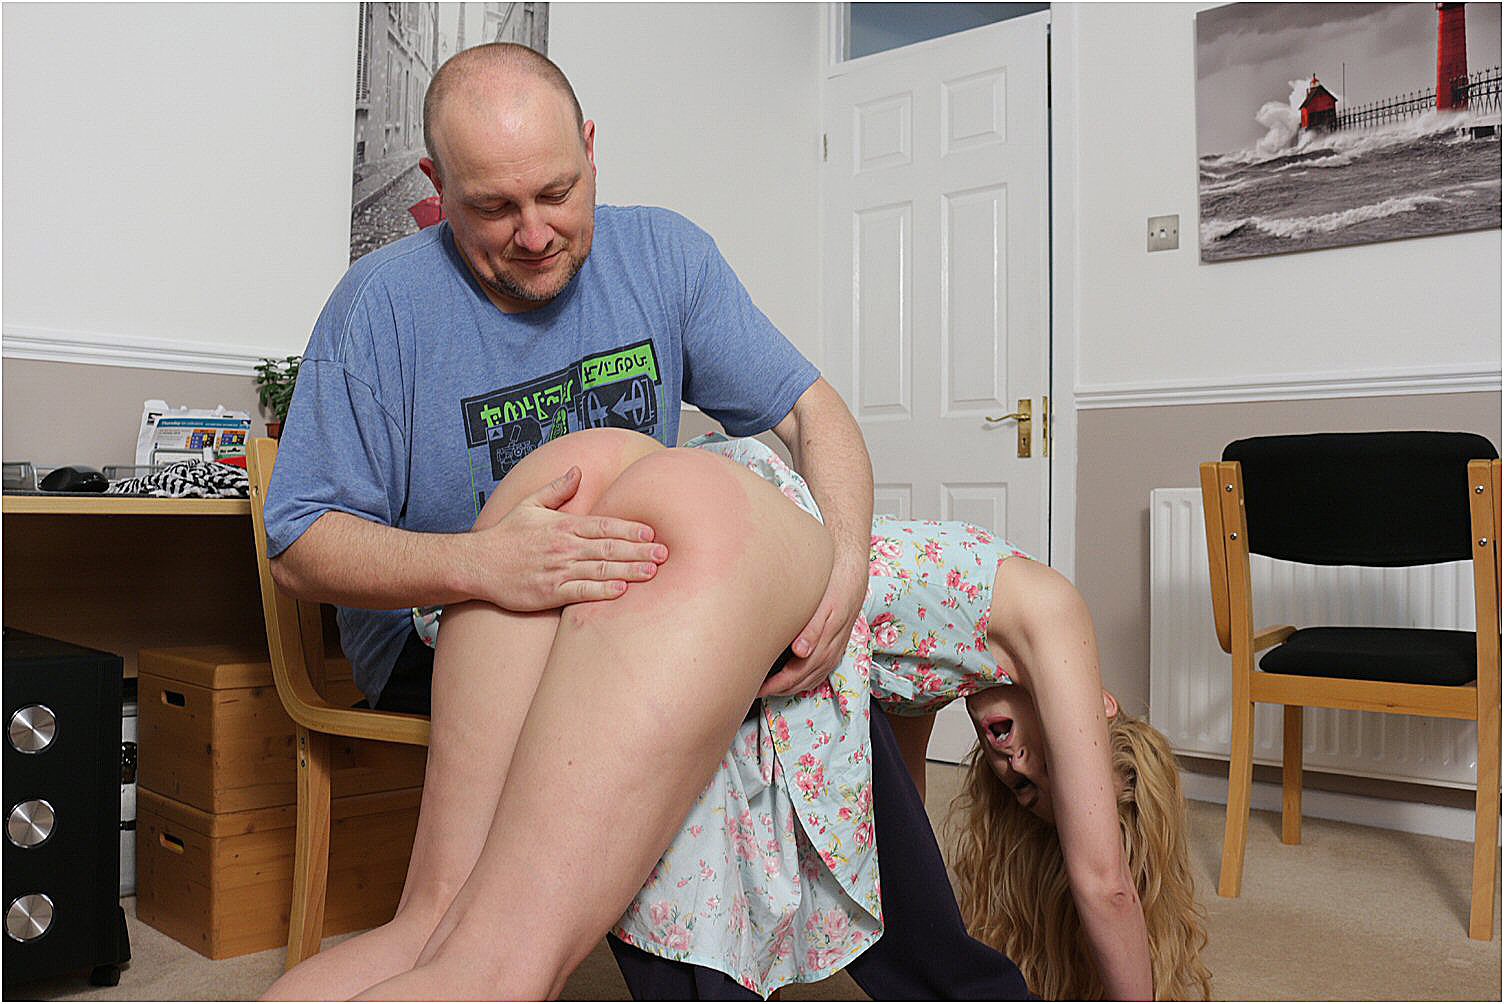 panking www.spankedcheeks.com women spanked